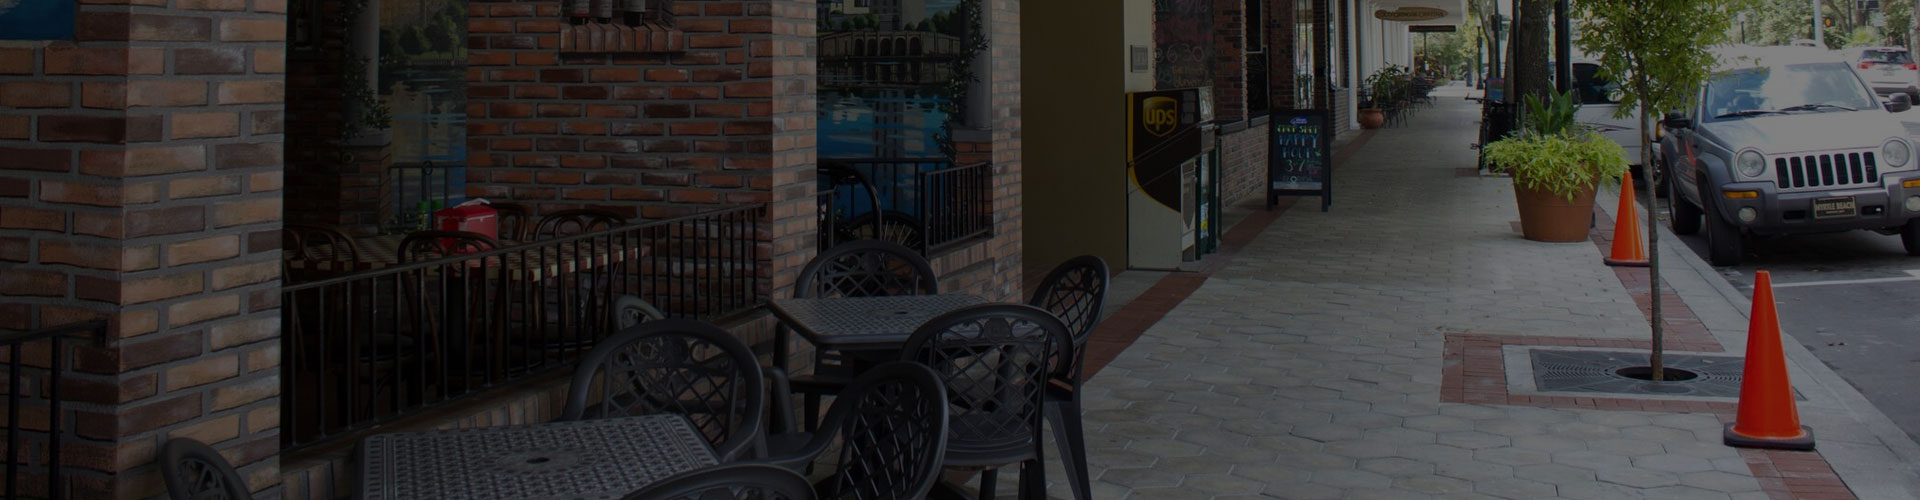 Downtown Lakeland<br>Restaurants